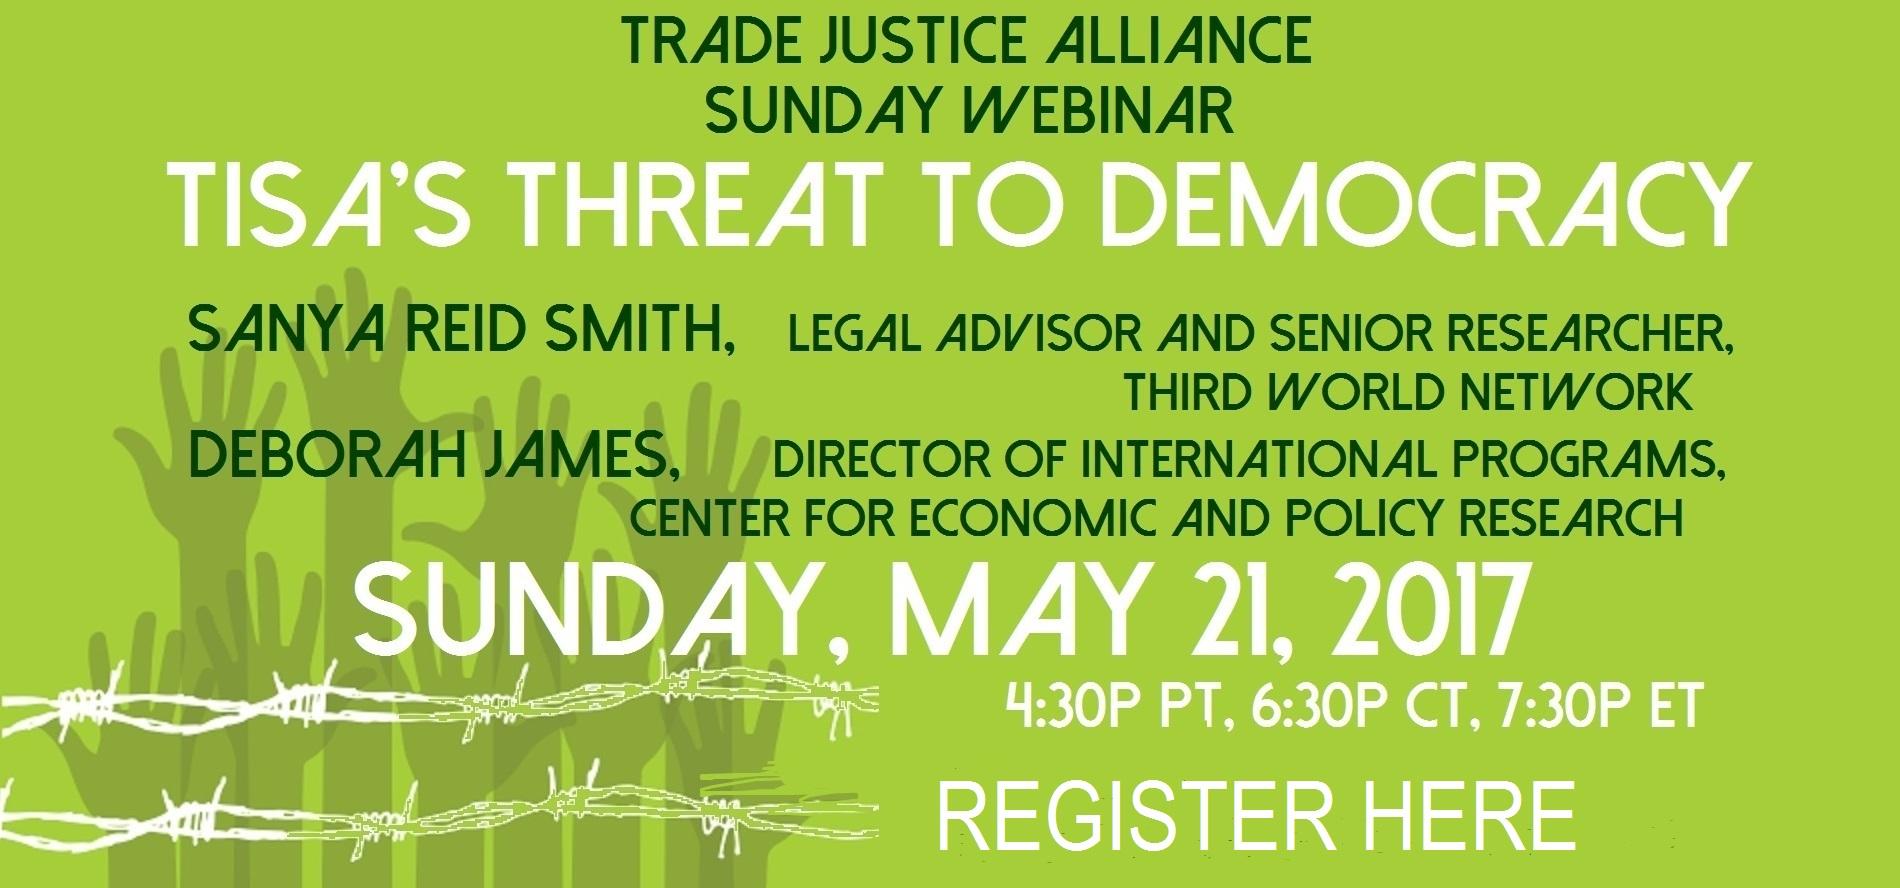 Tisa_threat_to_democracy_with_deborah